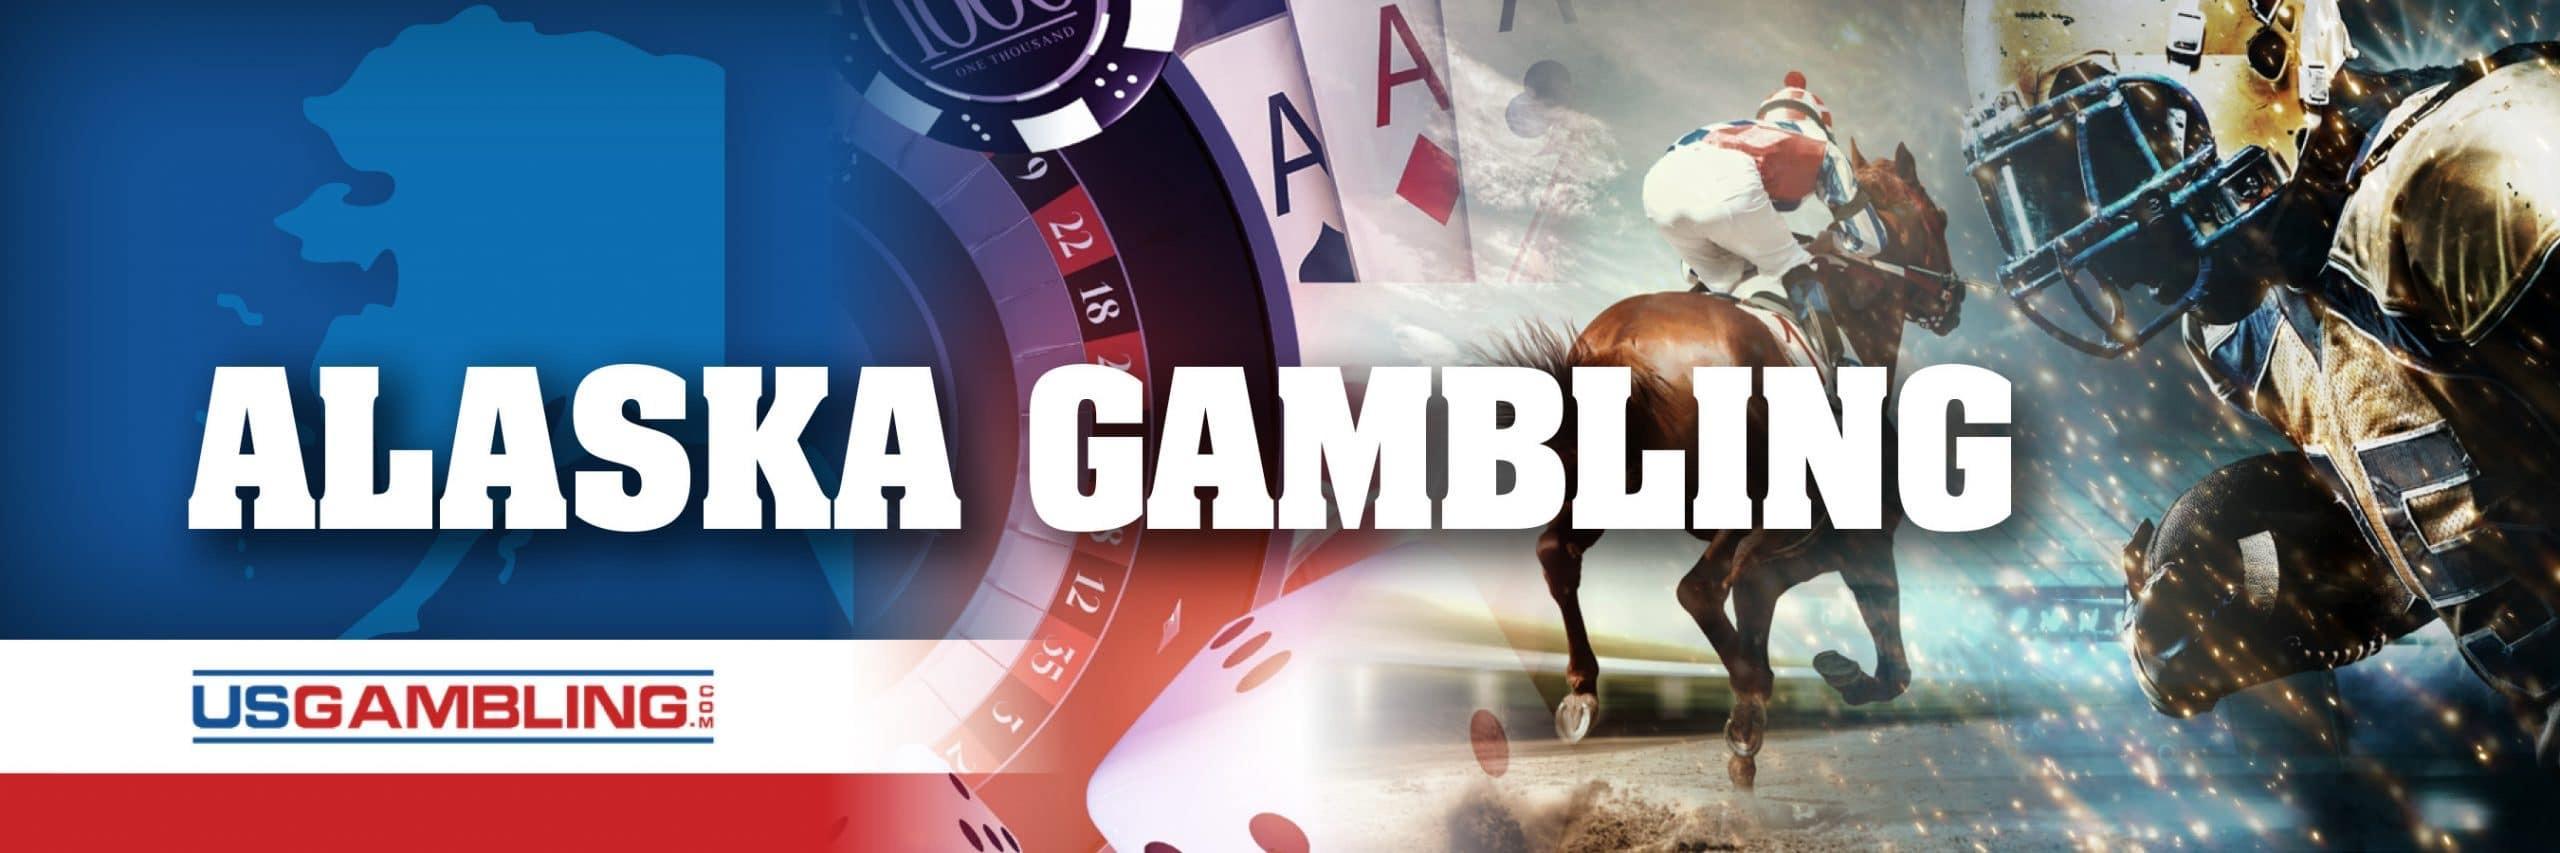 Assessment of the Alaska Online Gambling Opportunities